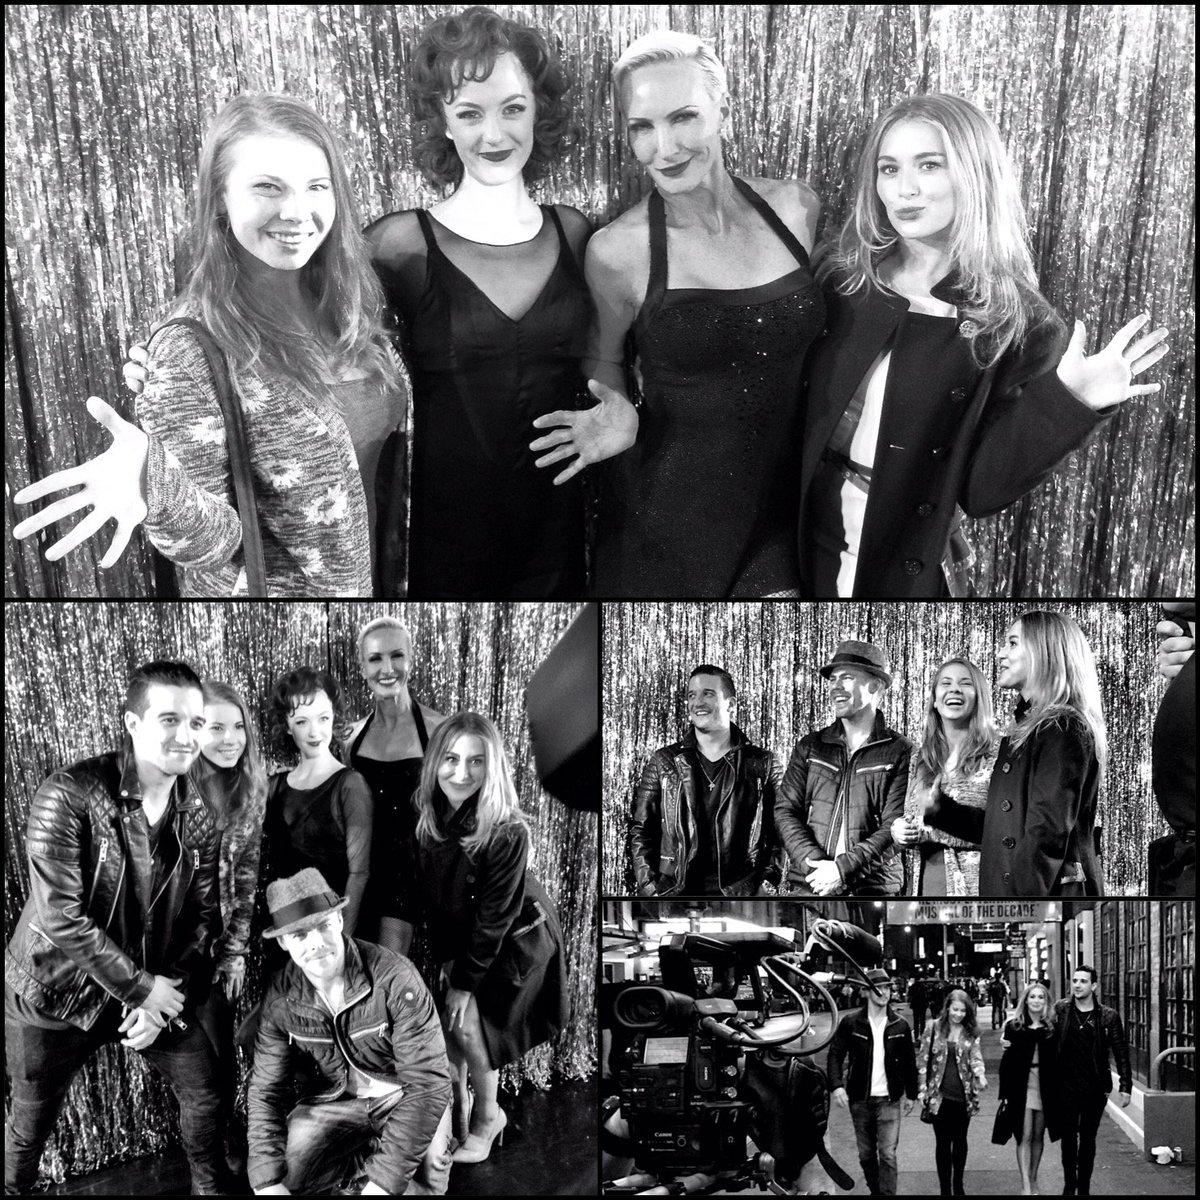 .@BindiIrwin, @derekhough, @AlexaVega, @MarkBallas meet our stars for inspiration for tonight's @DancingABC! #DWTS https://t.co/1xegpqPRnn